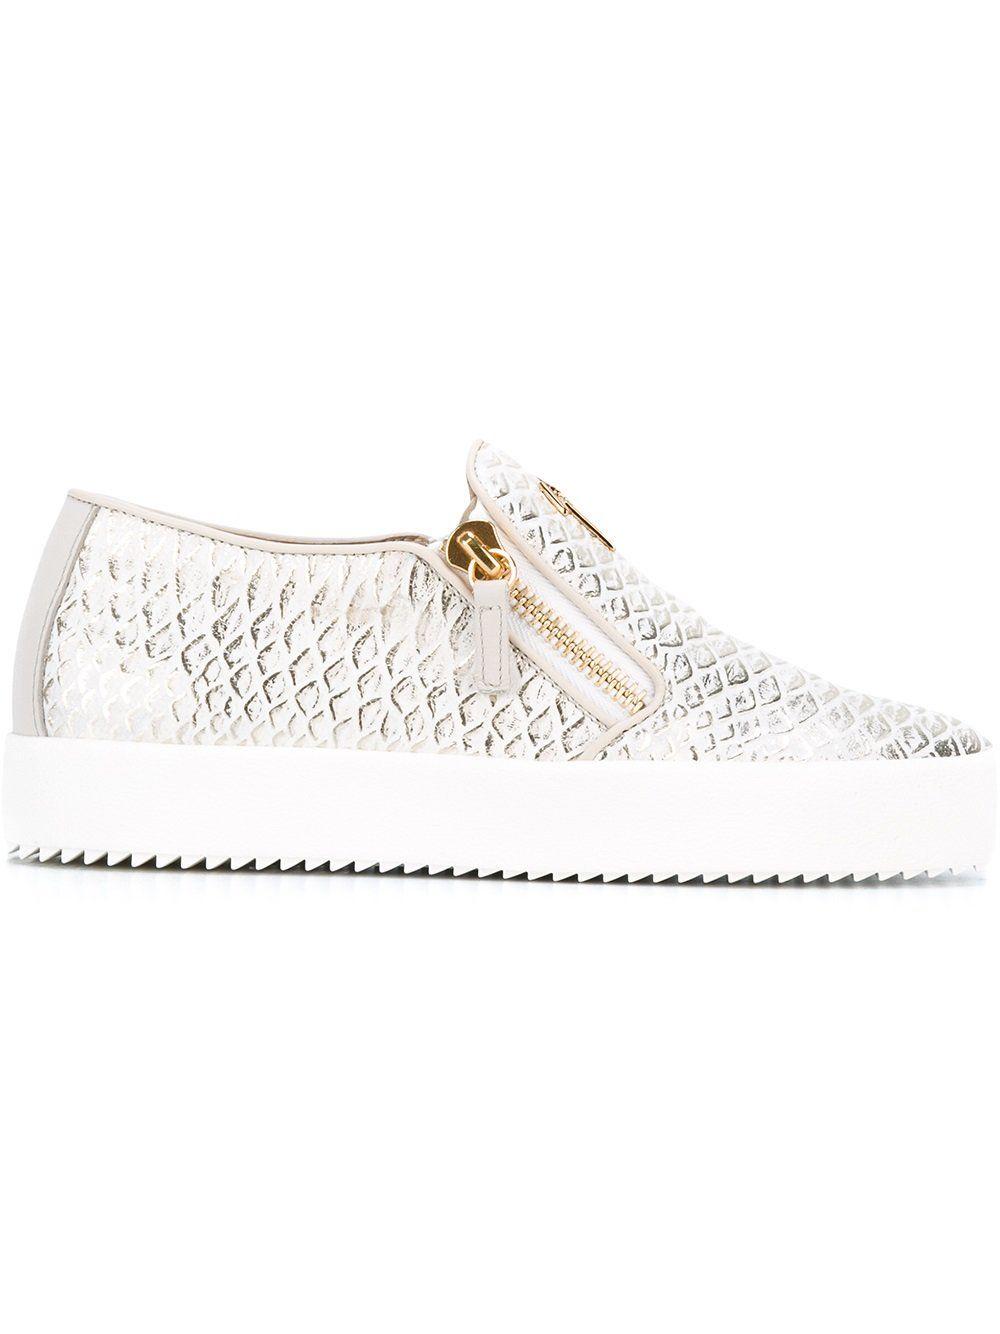 66626c4a107b8 GIUSEPPE ZANOTTI DESIGN | Eve python effect sneakers #Shoes #GIUSEPPE  ZANOTTI DESIGN